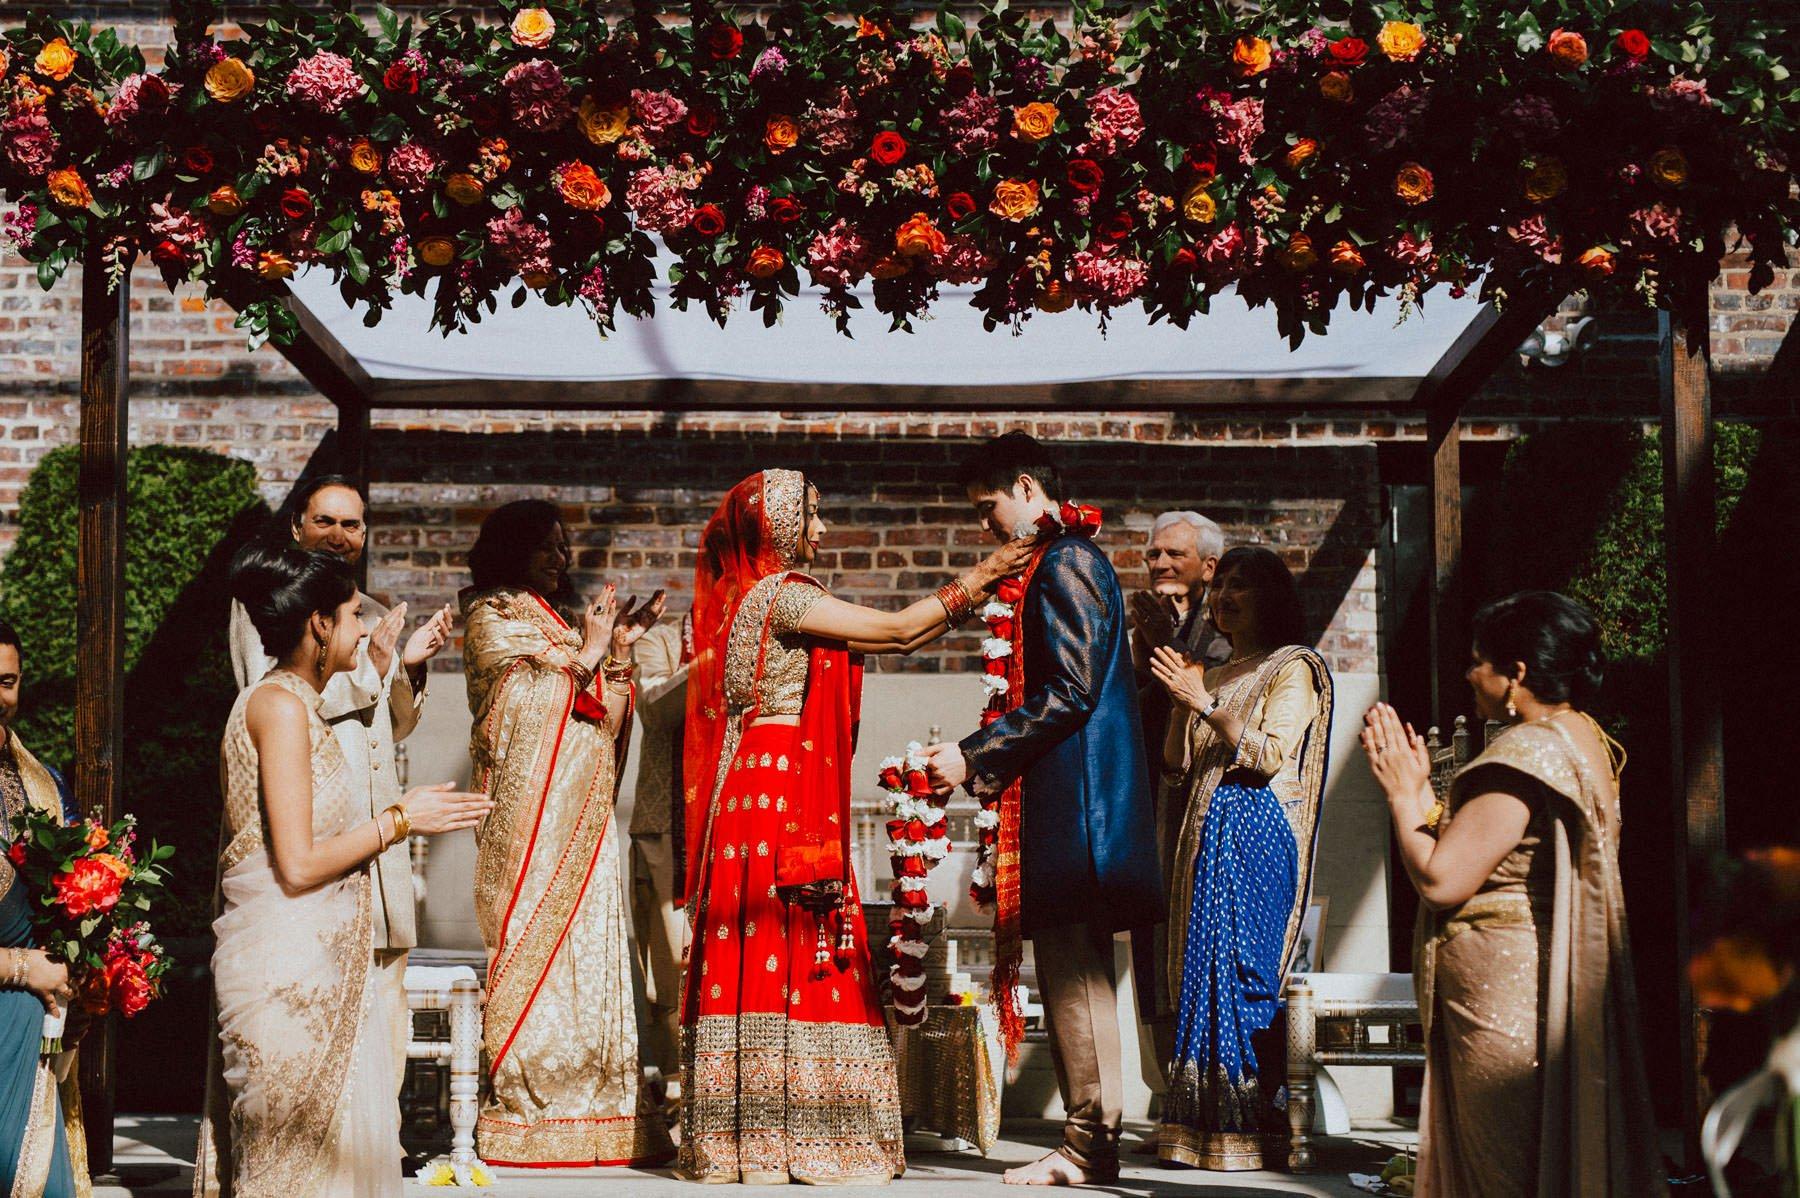 vie-philadelphia-indian-wedding-77.jpg